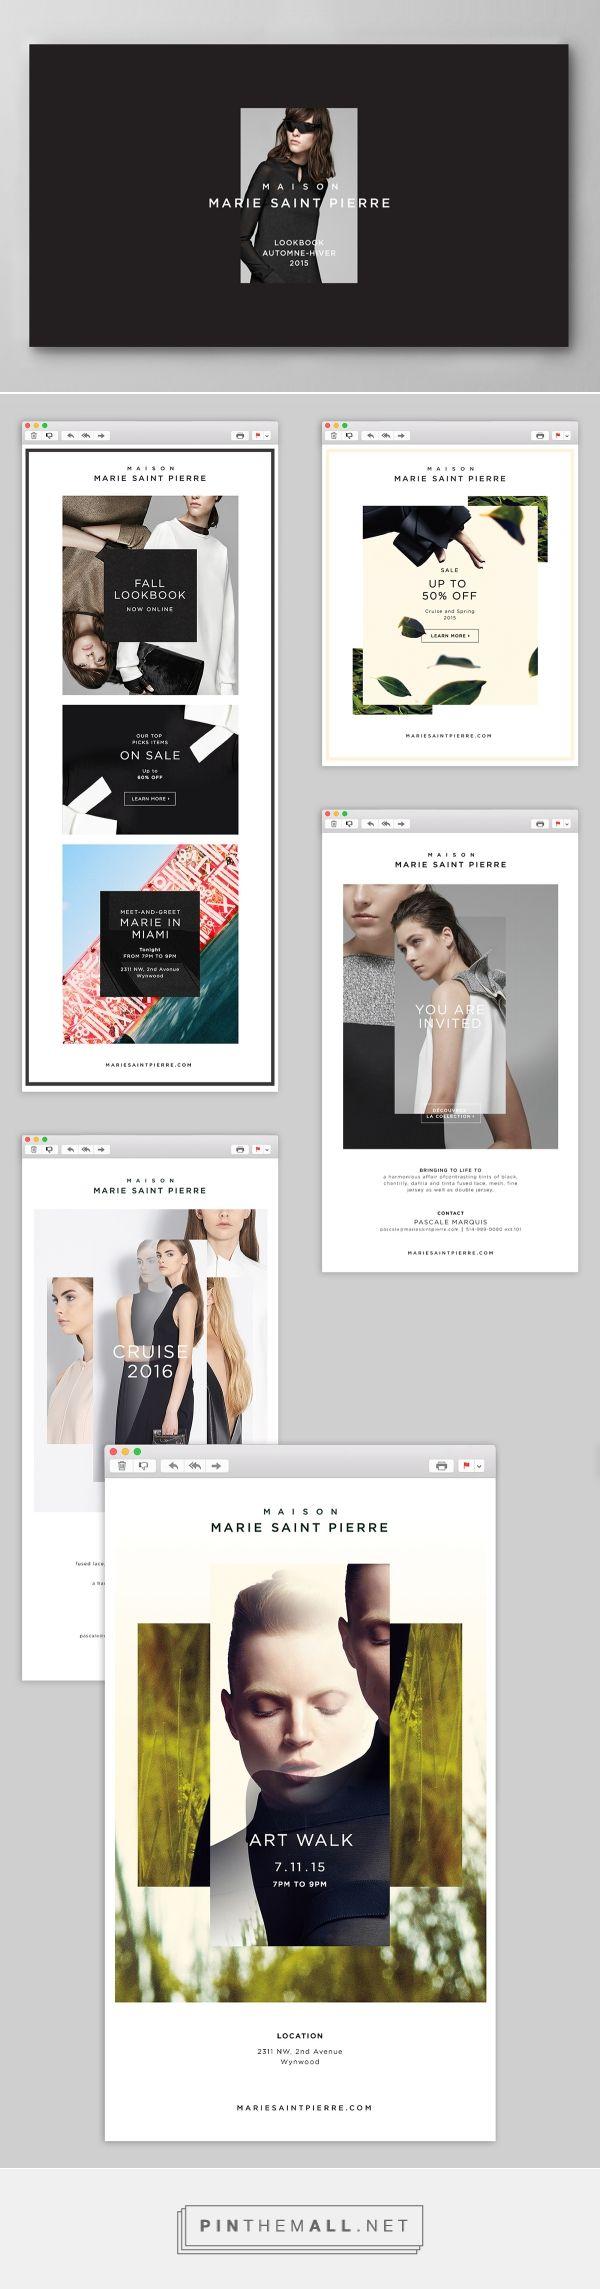 Maison Marie Saint Pierre - lookbook & Newsletters on Behance - created via http://pinthemall.net